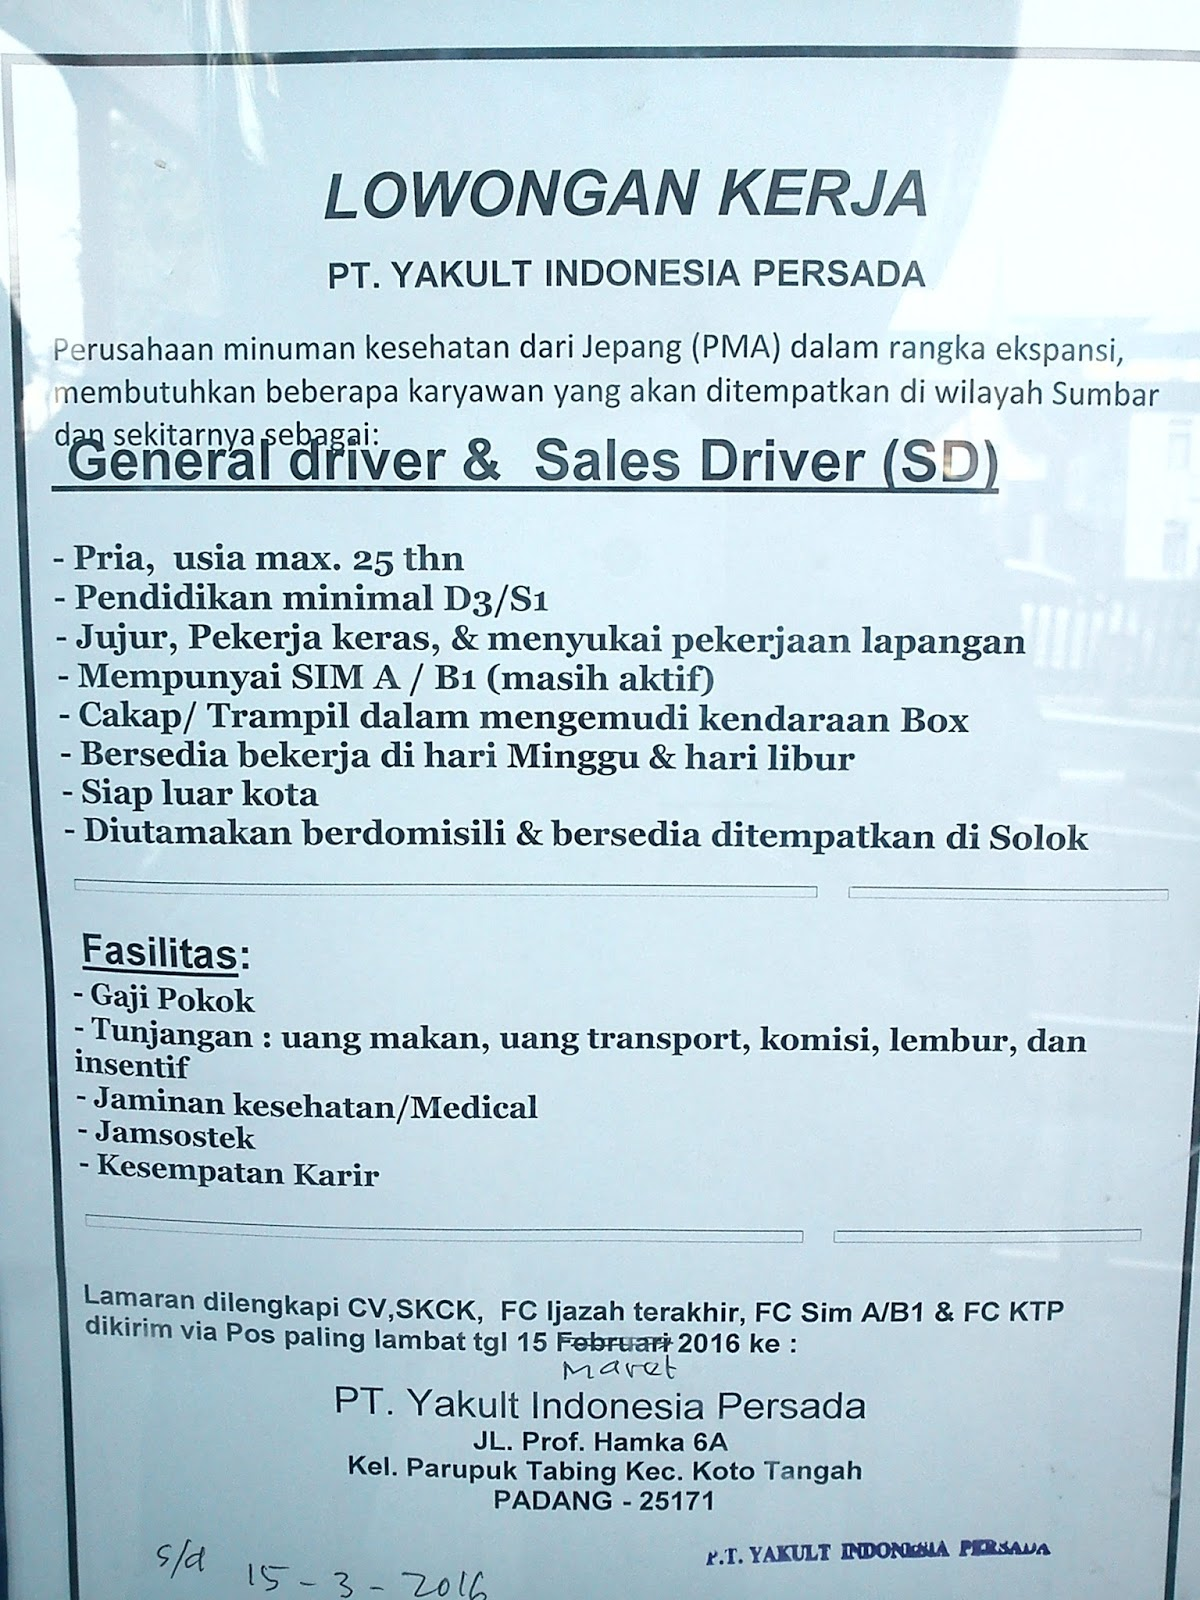 Lowongan Kerja Yakult Pekanbaru Lowongan Kerja Jakarta